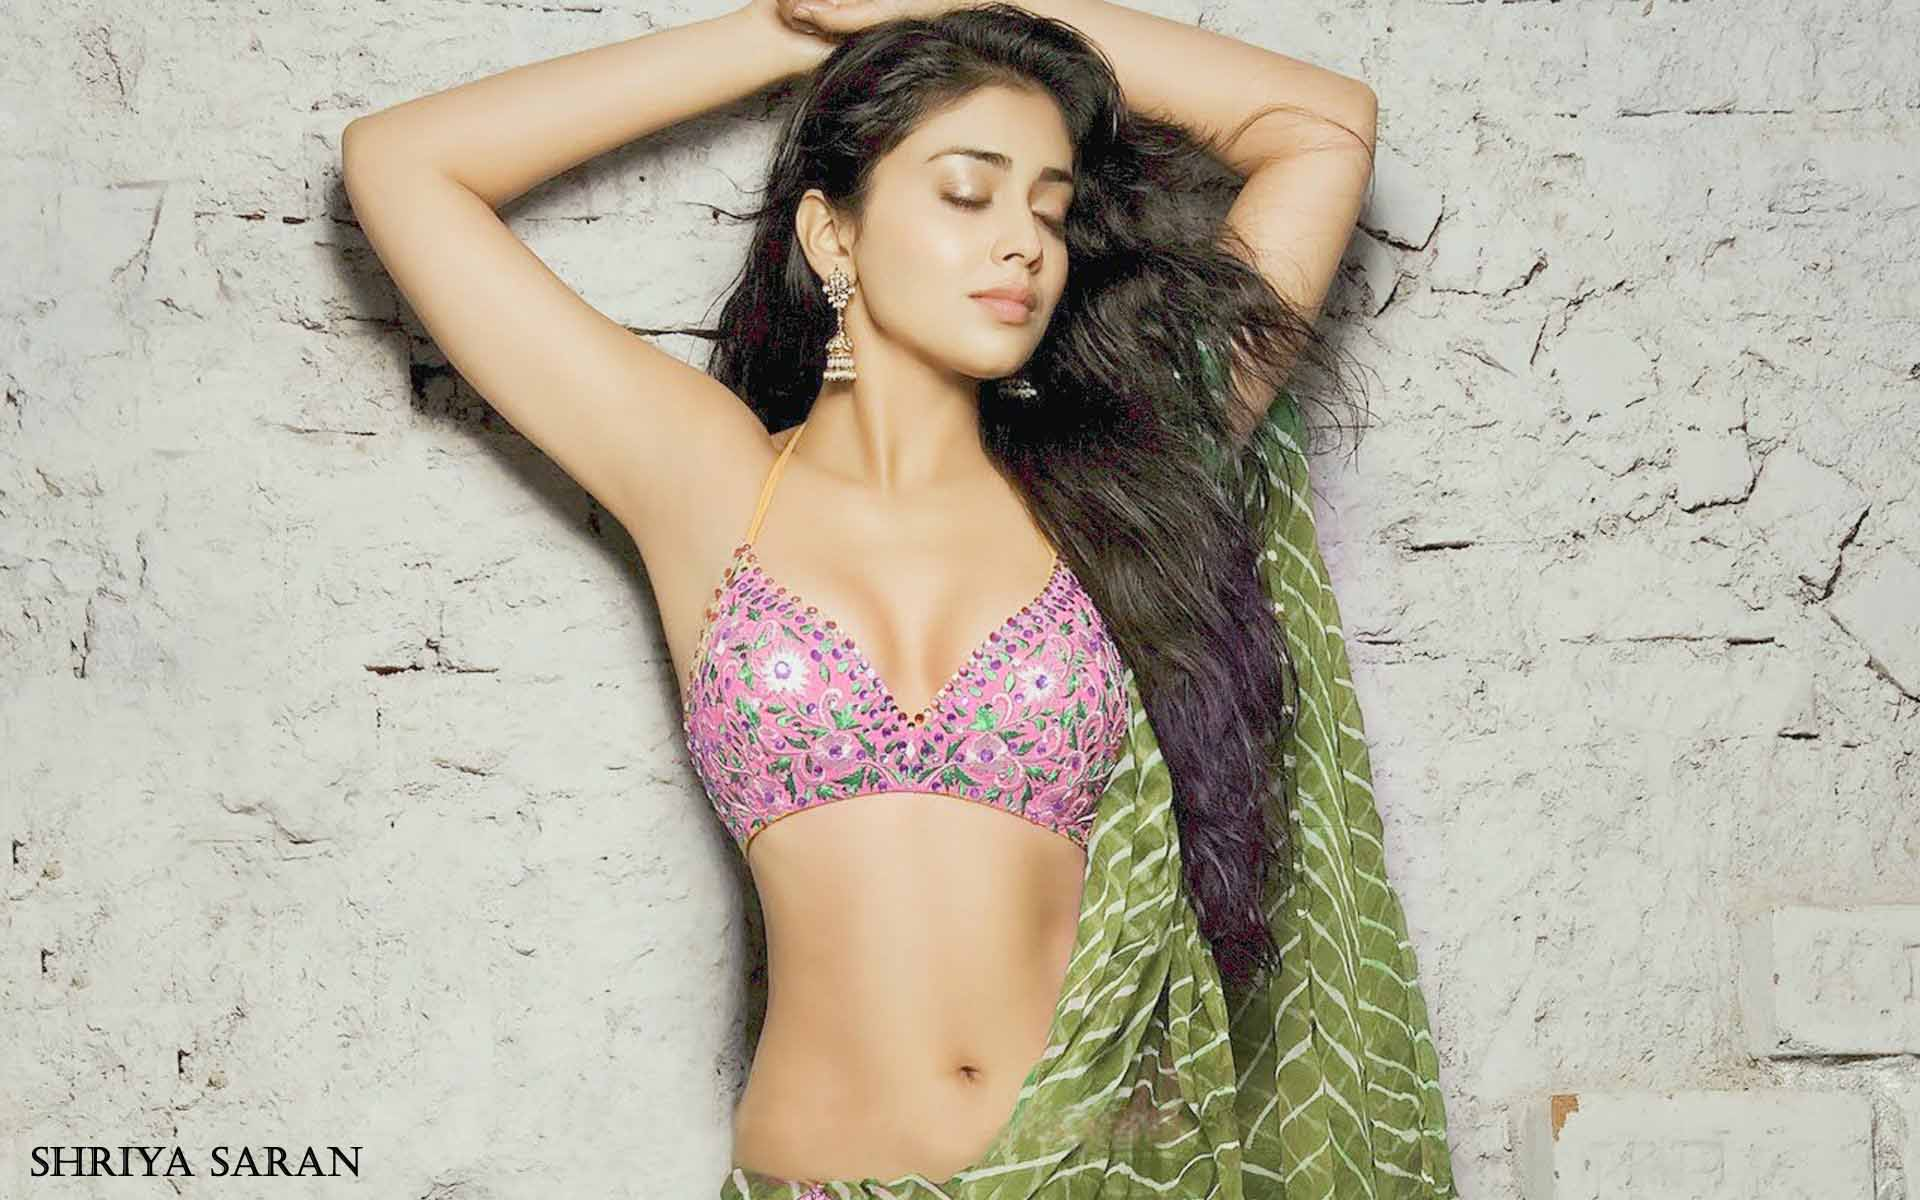 Bollywood Sleeveless Actress Shriya Saran Hot Pics Neha Bhasin Apple Bottoms 1920x1200 Wallpaper Teahub Io